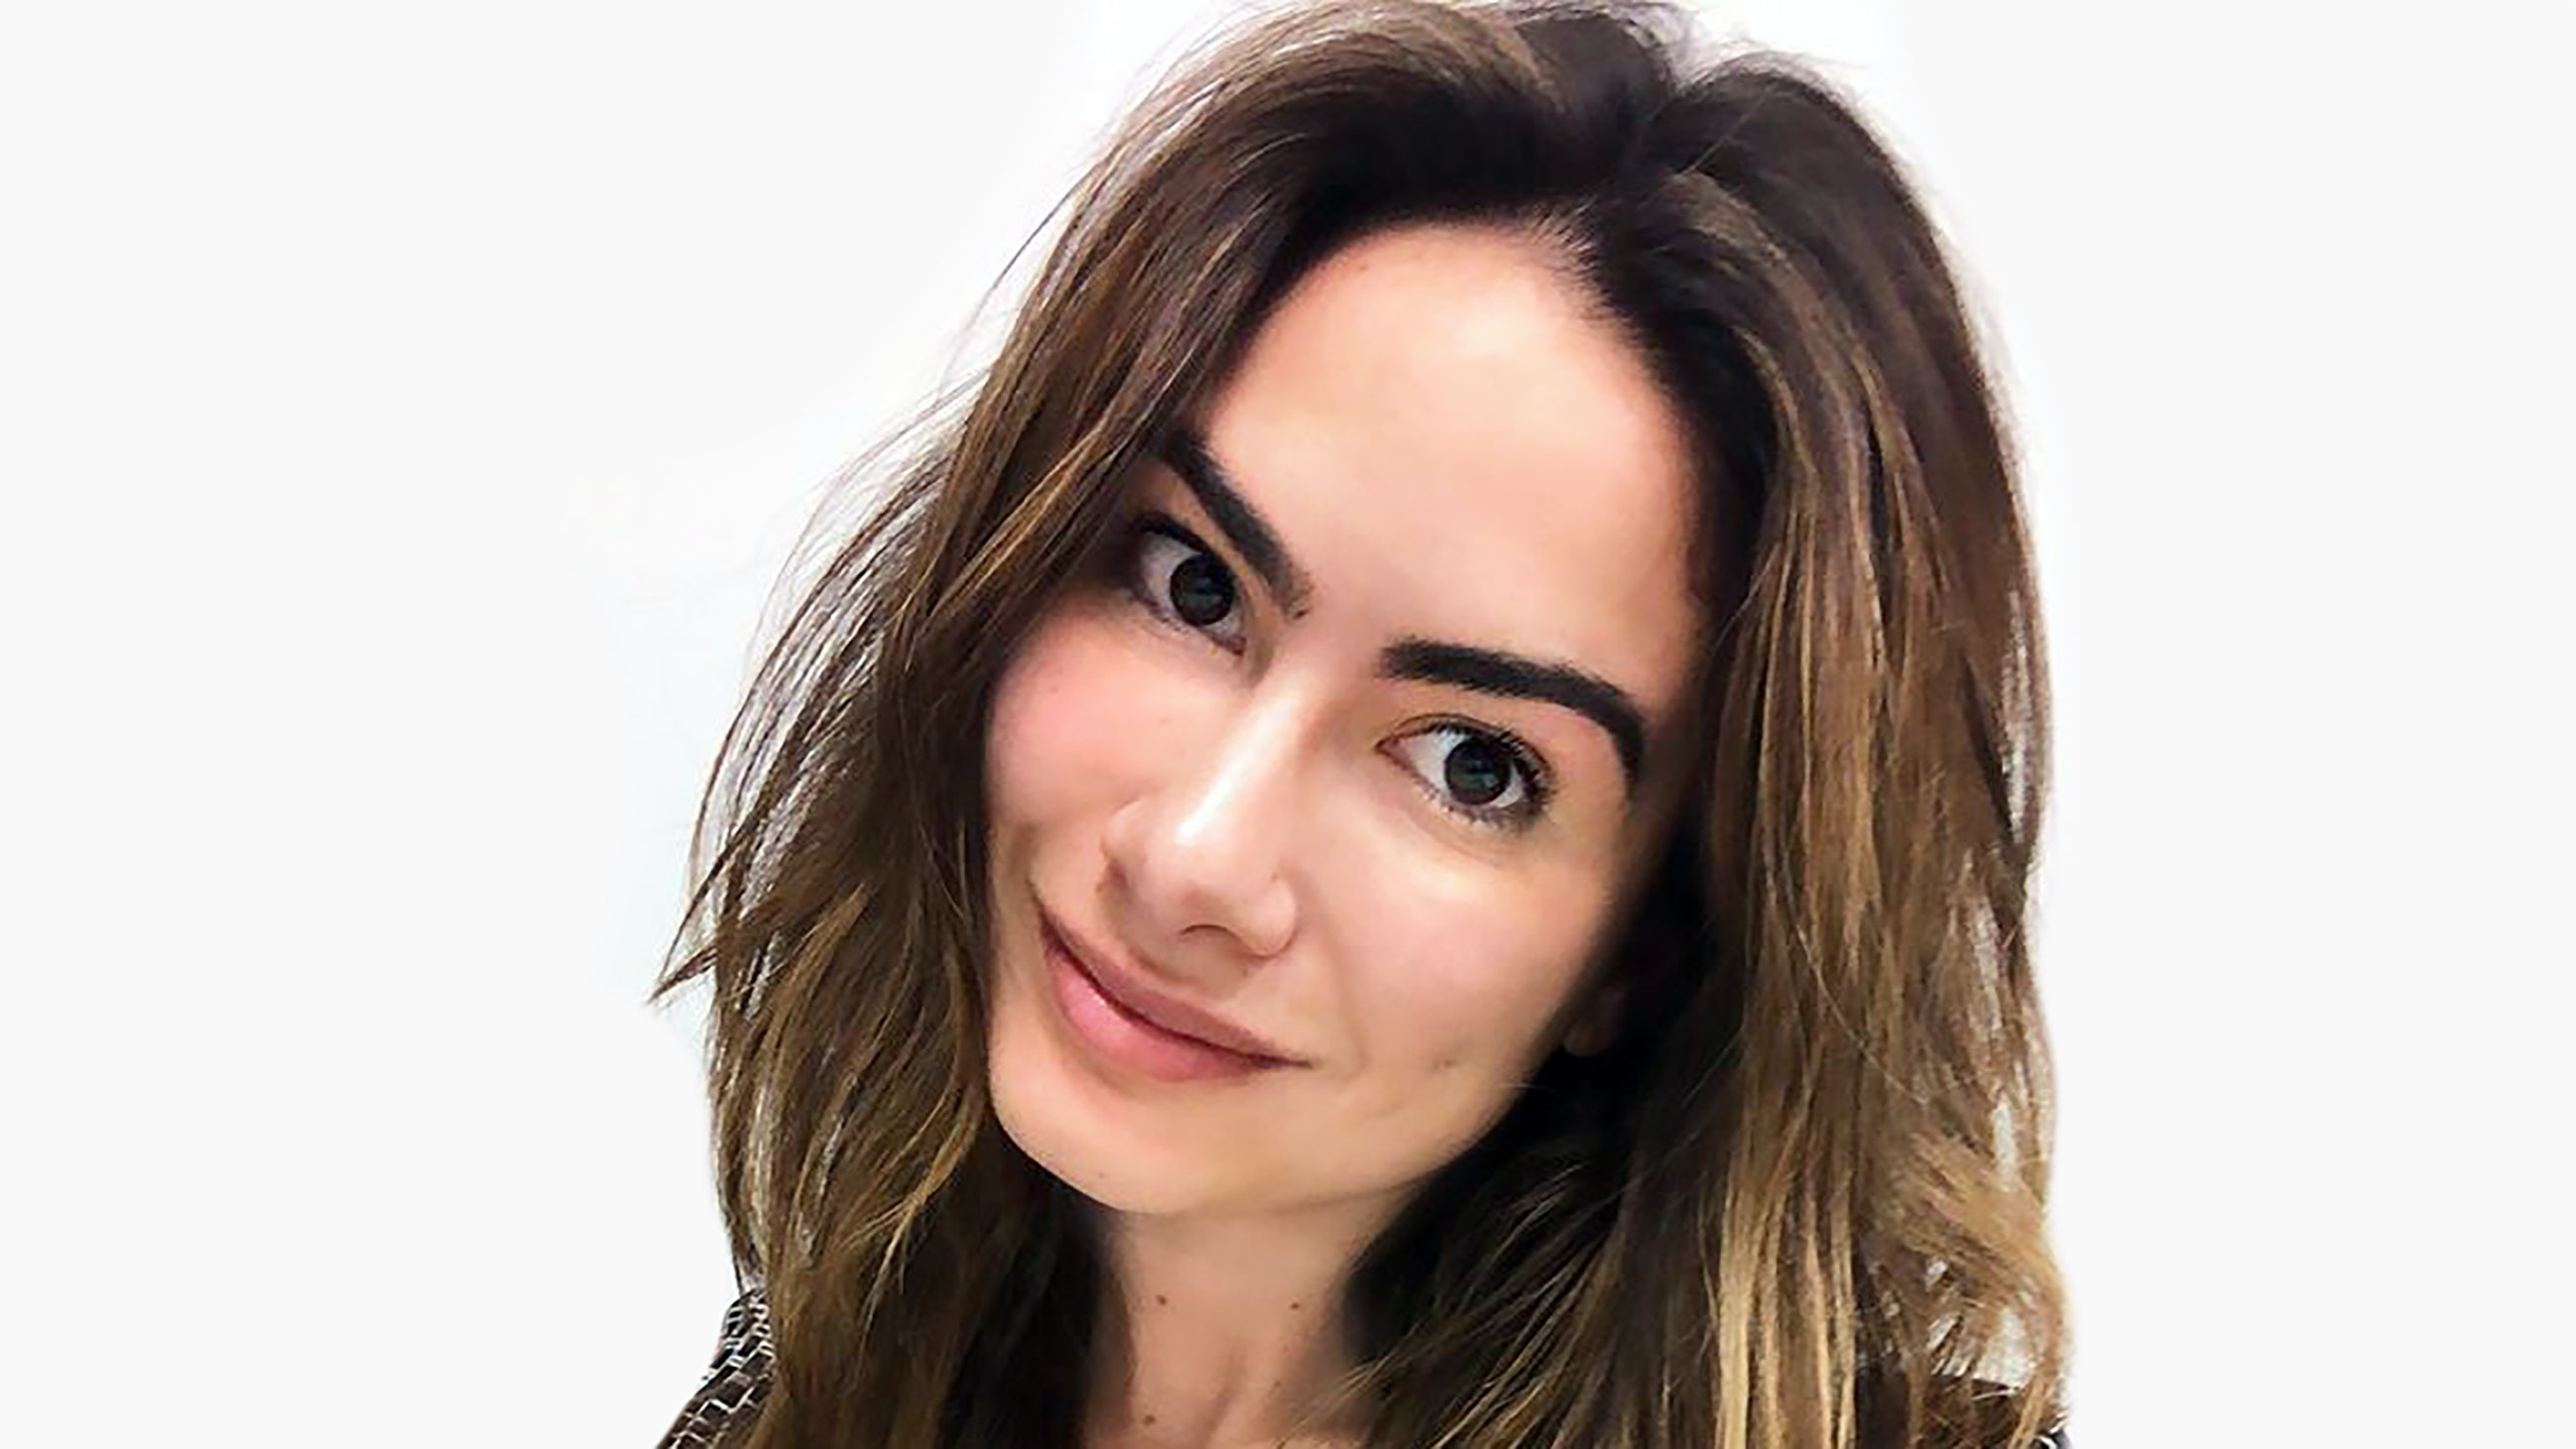 Zoe Weiner smiling